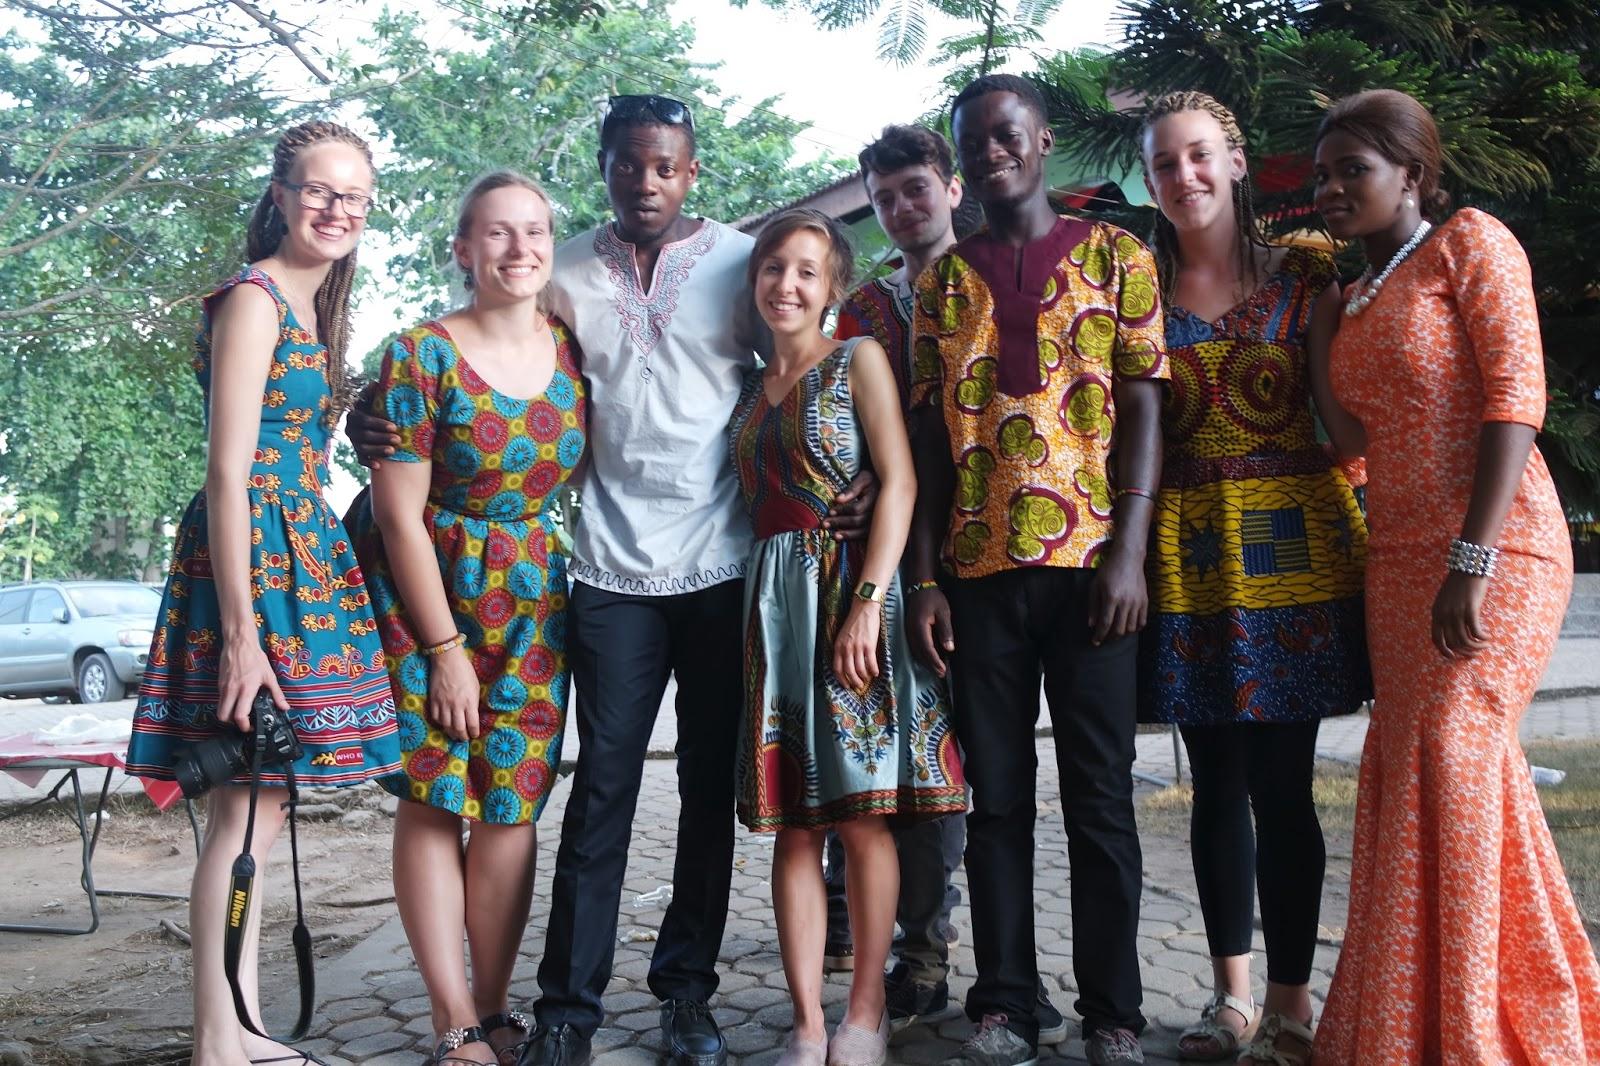 ghanas vibes: Hochzeit in Ghana